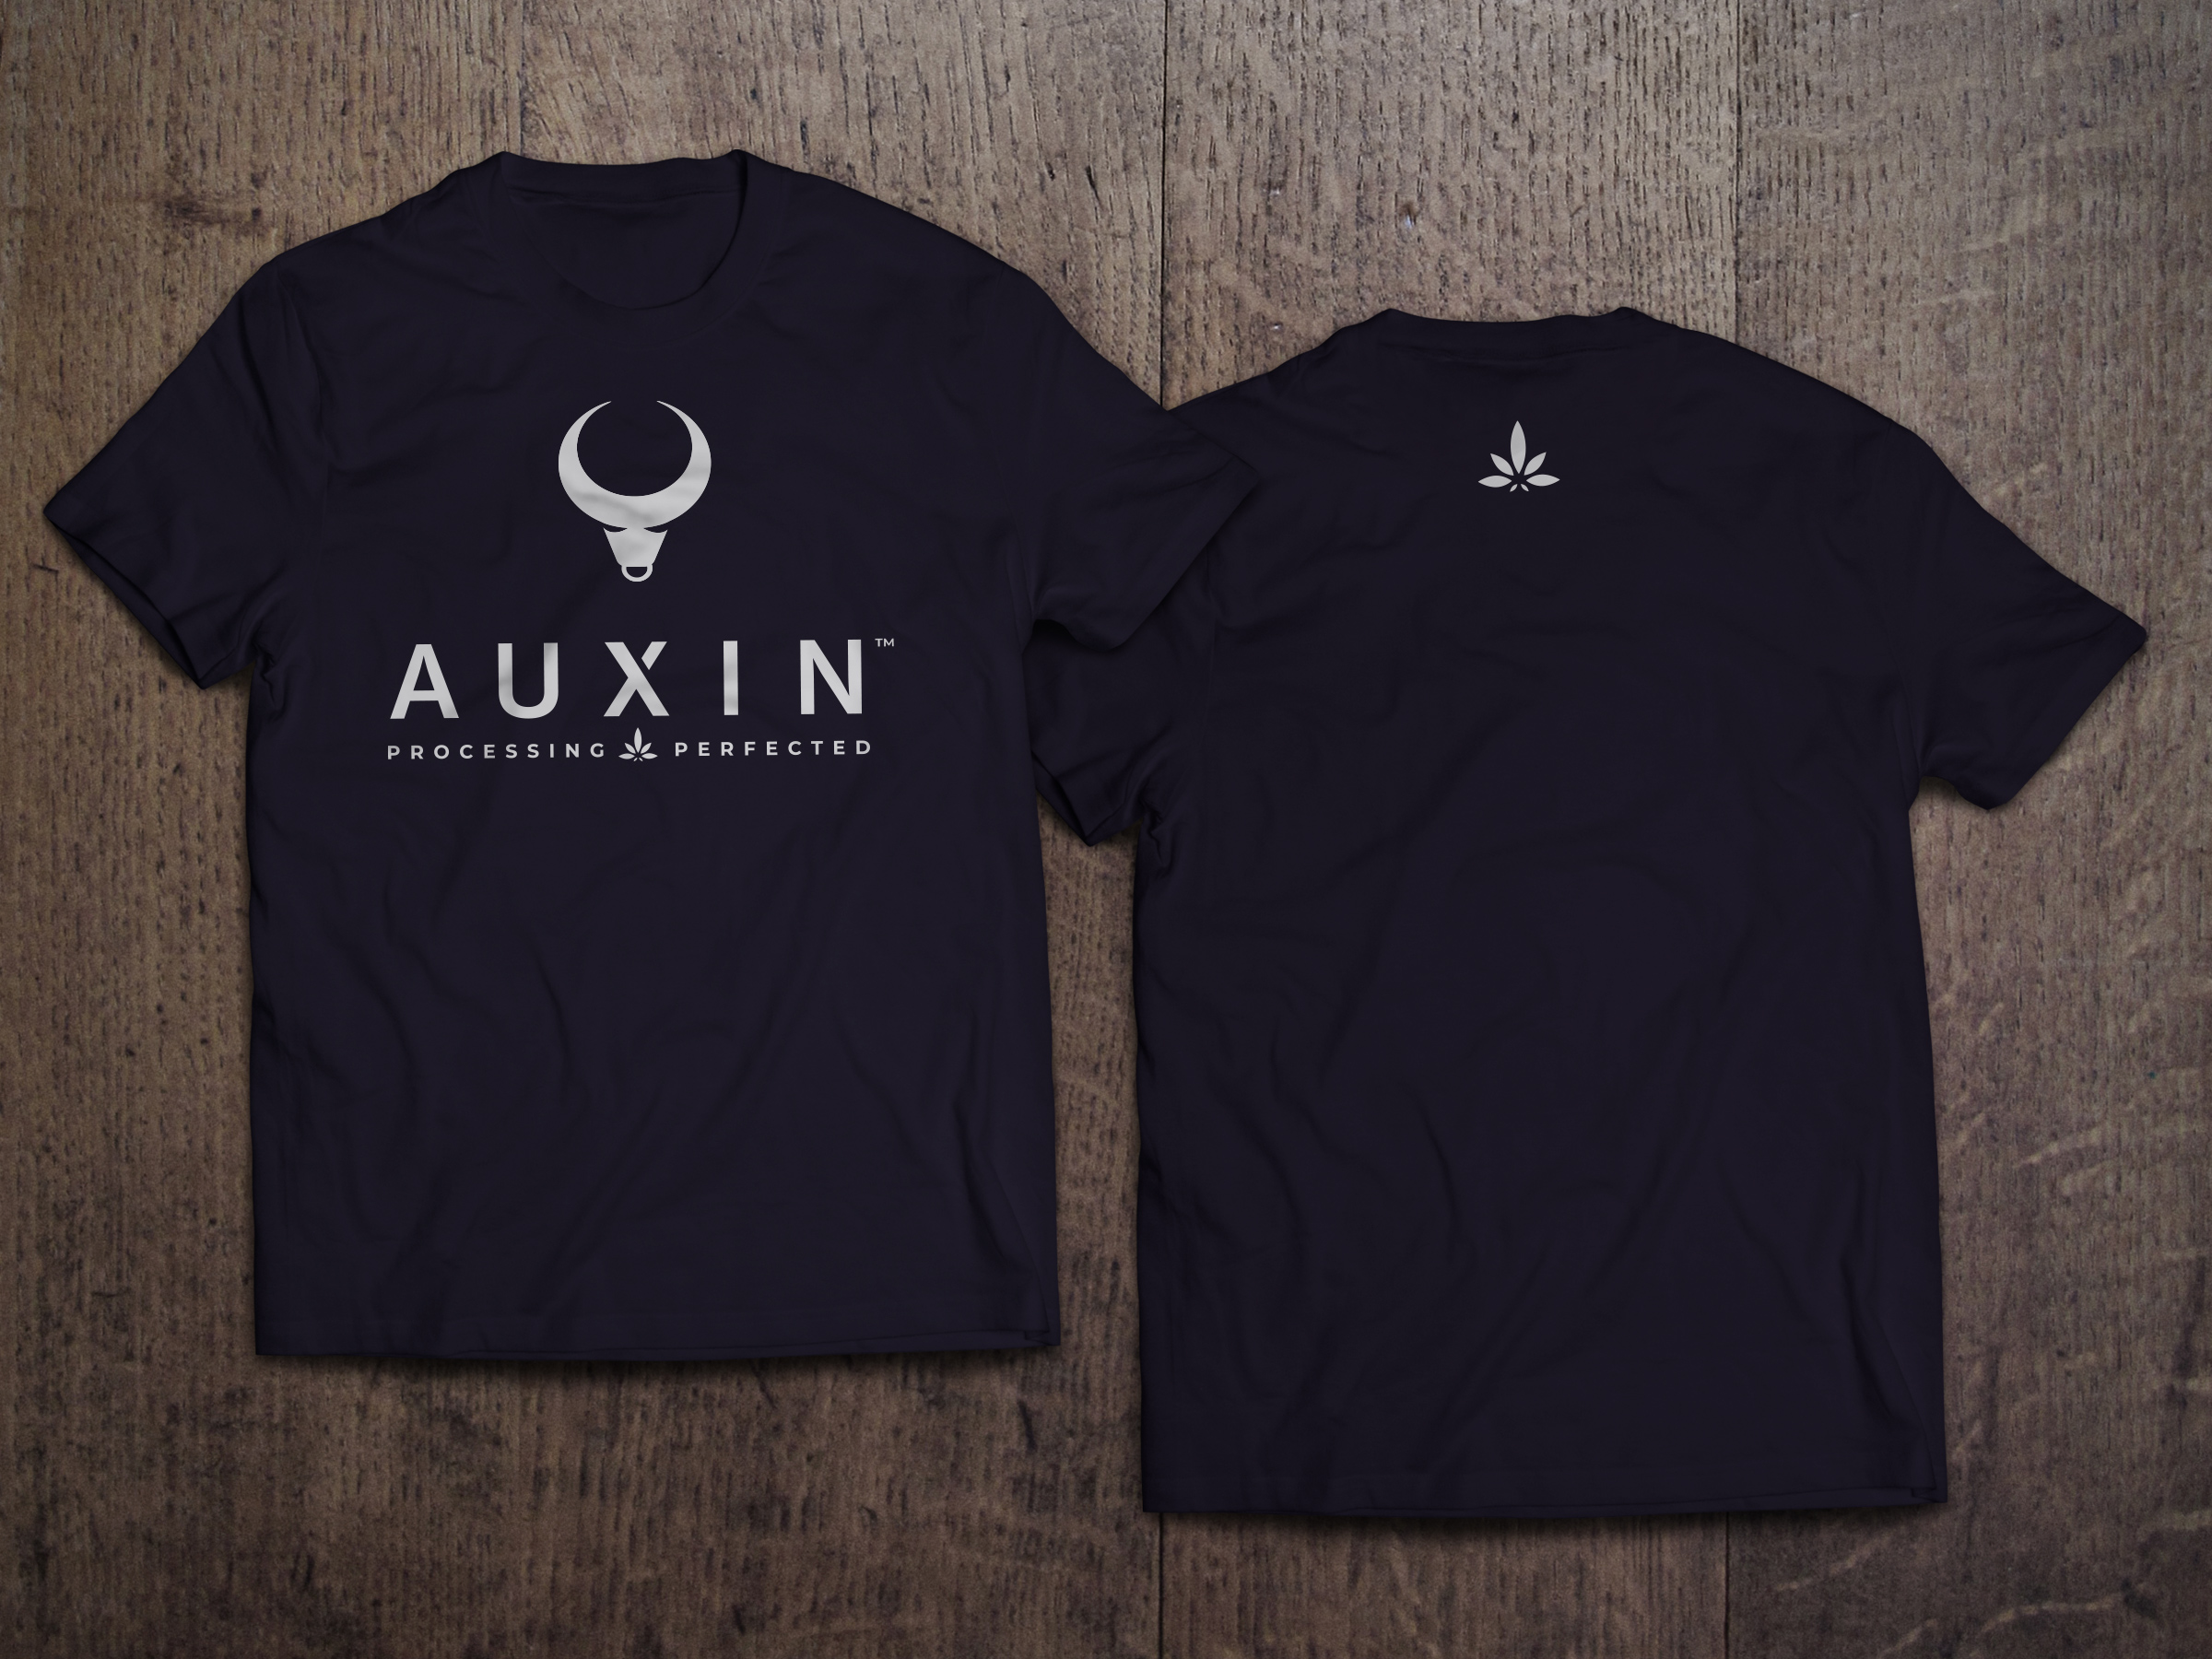 T-Shirt-MockUp-Front-and-Back.jpg